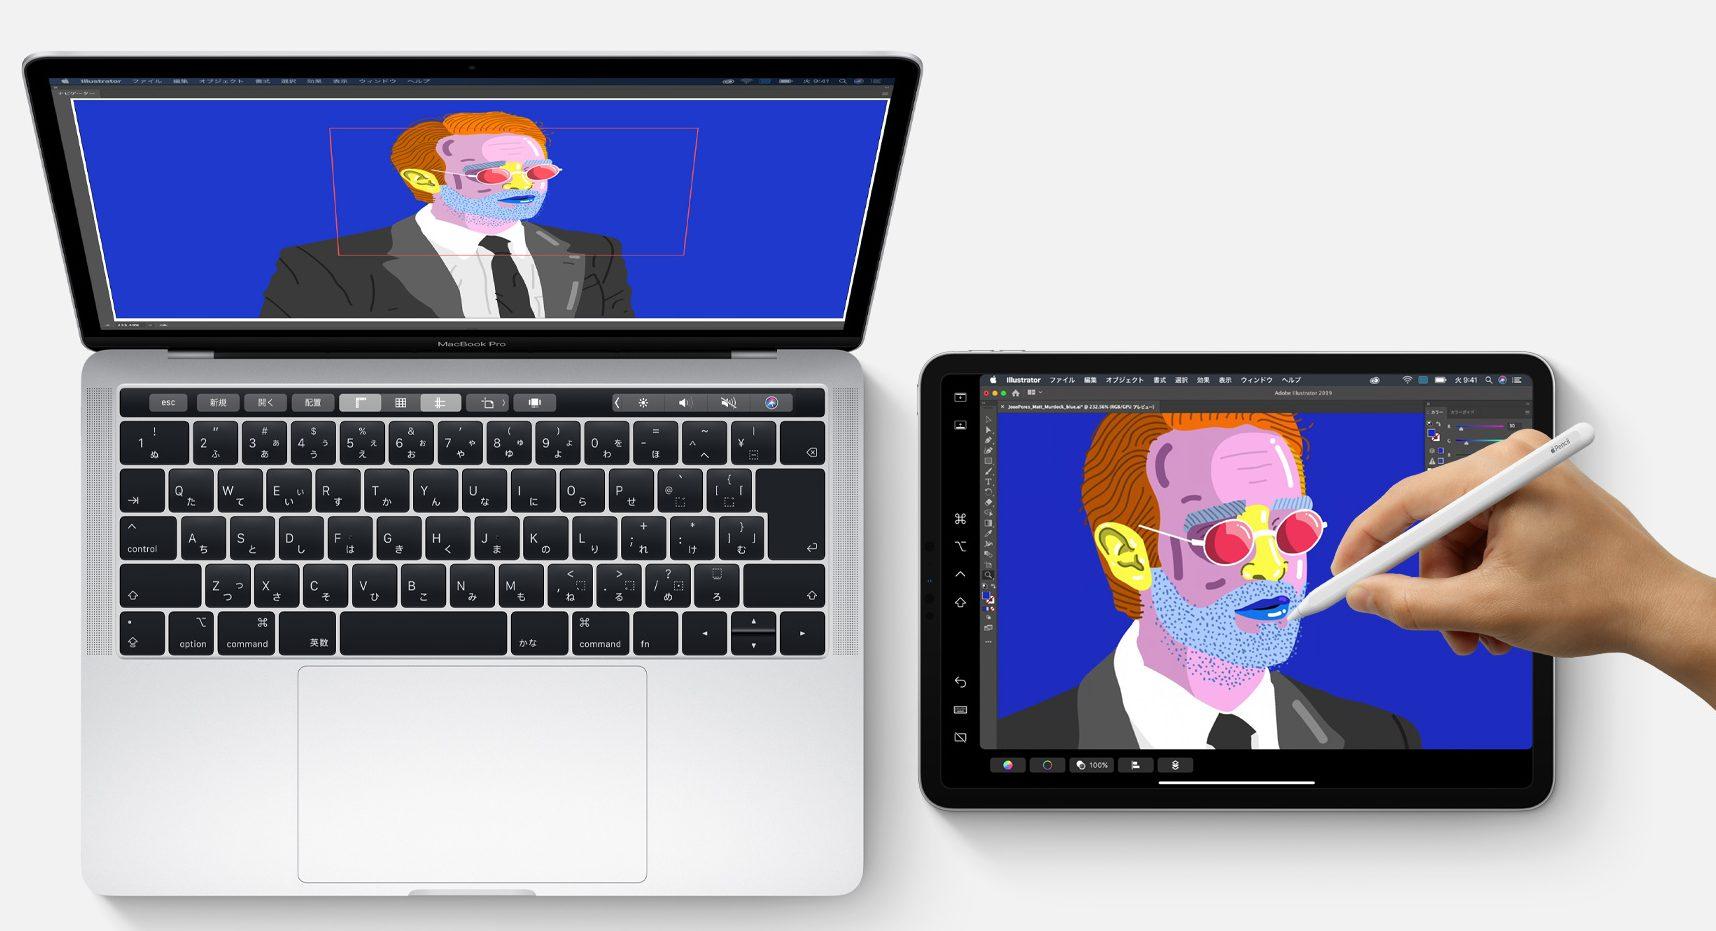 macbookとipadをsidecarでミラーリング